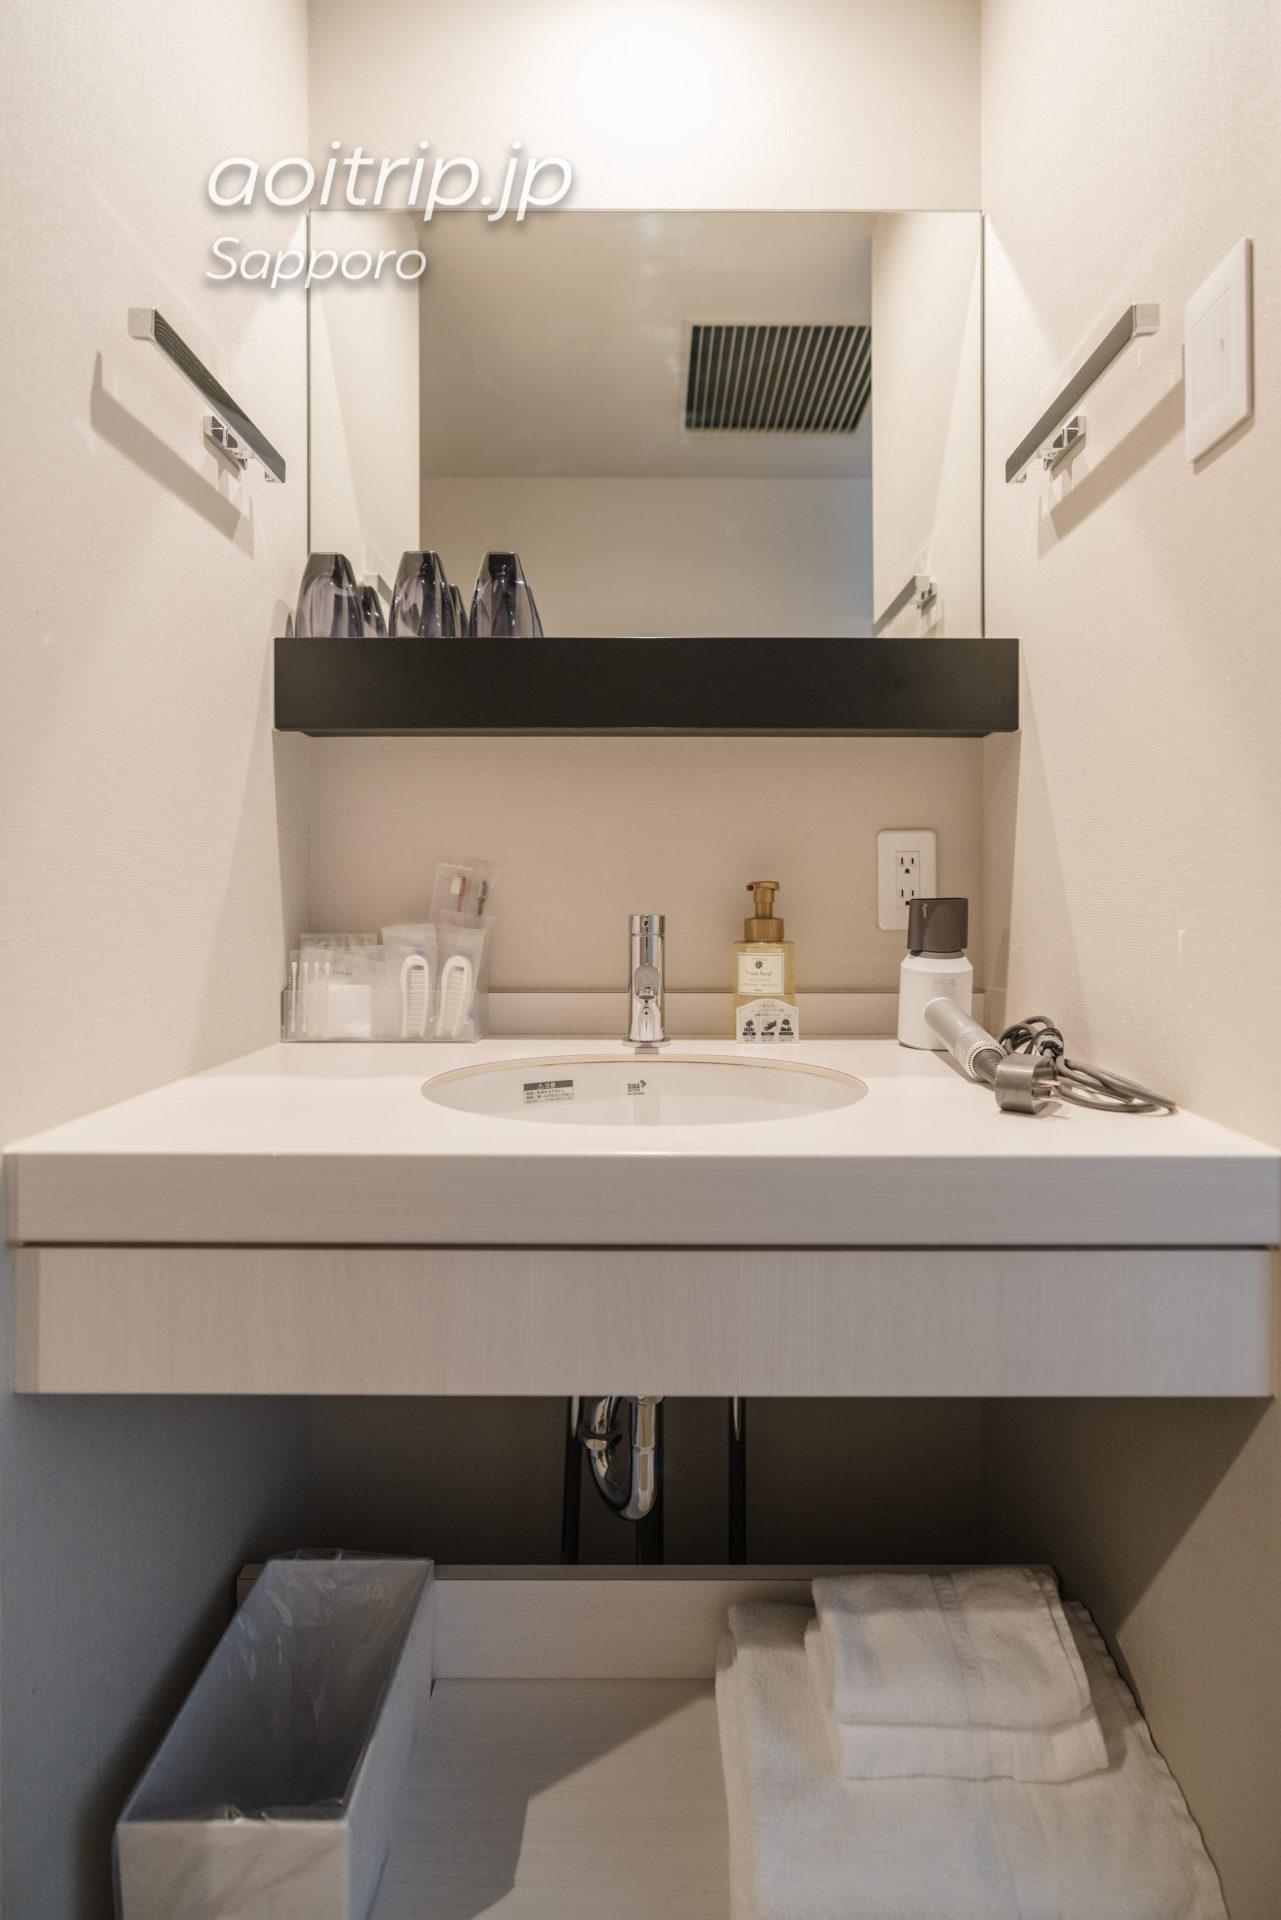 JRイン札幌南口プレミアツインの洗面台